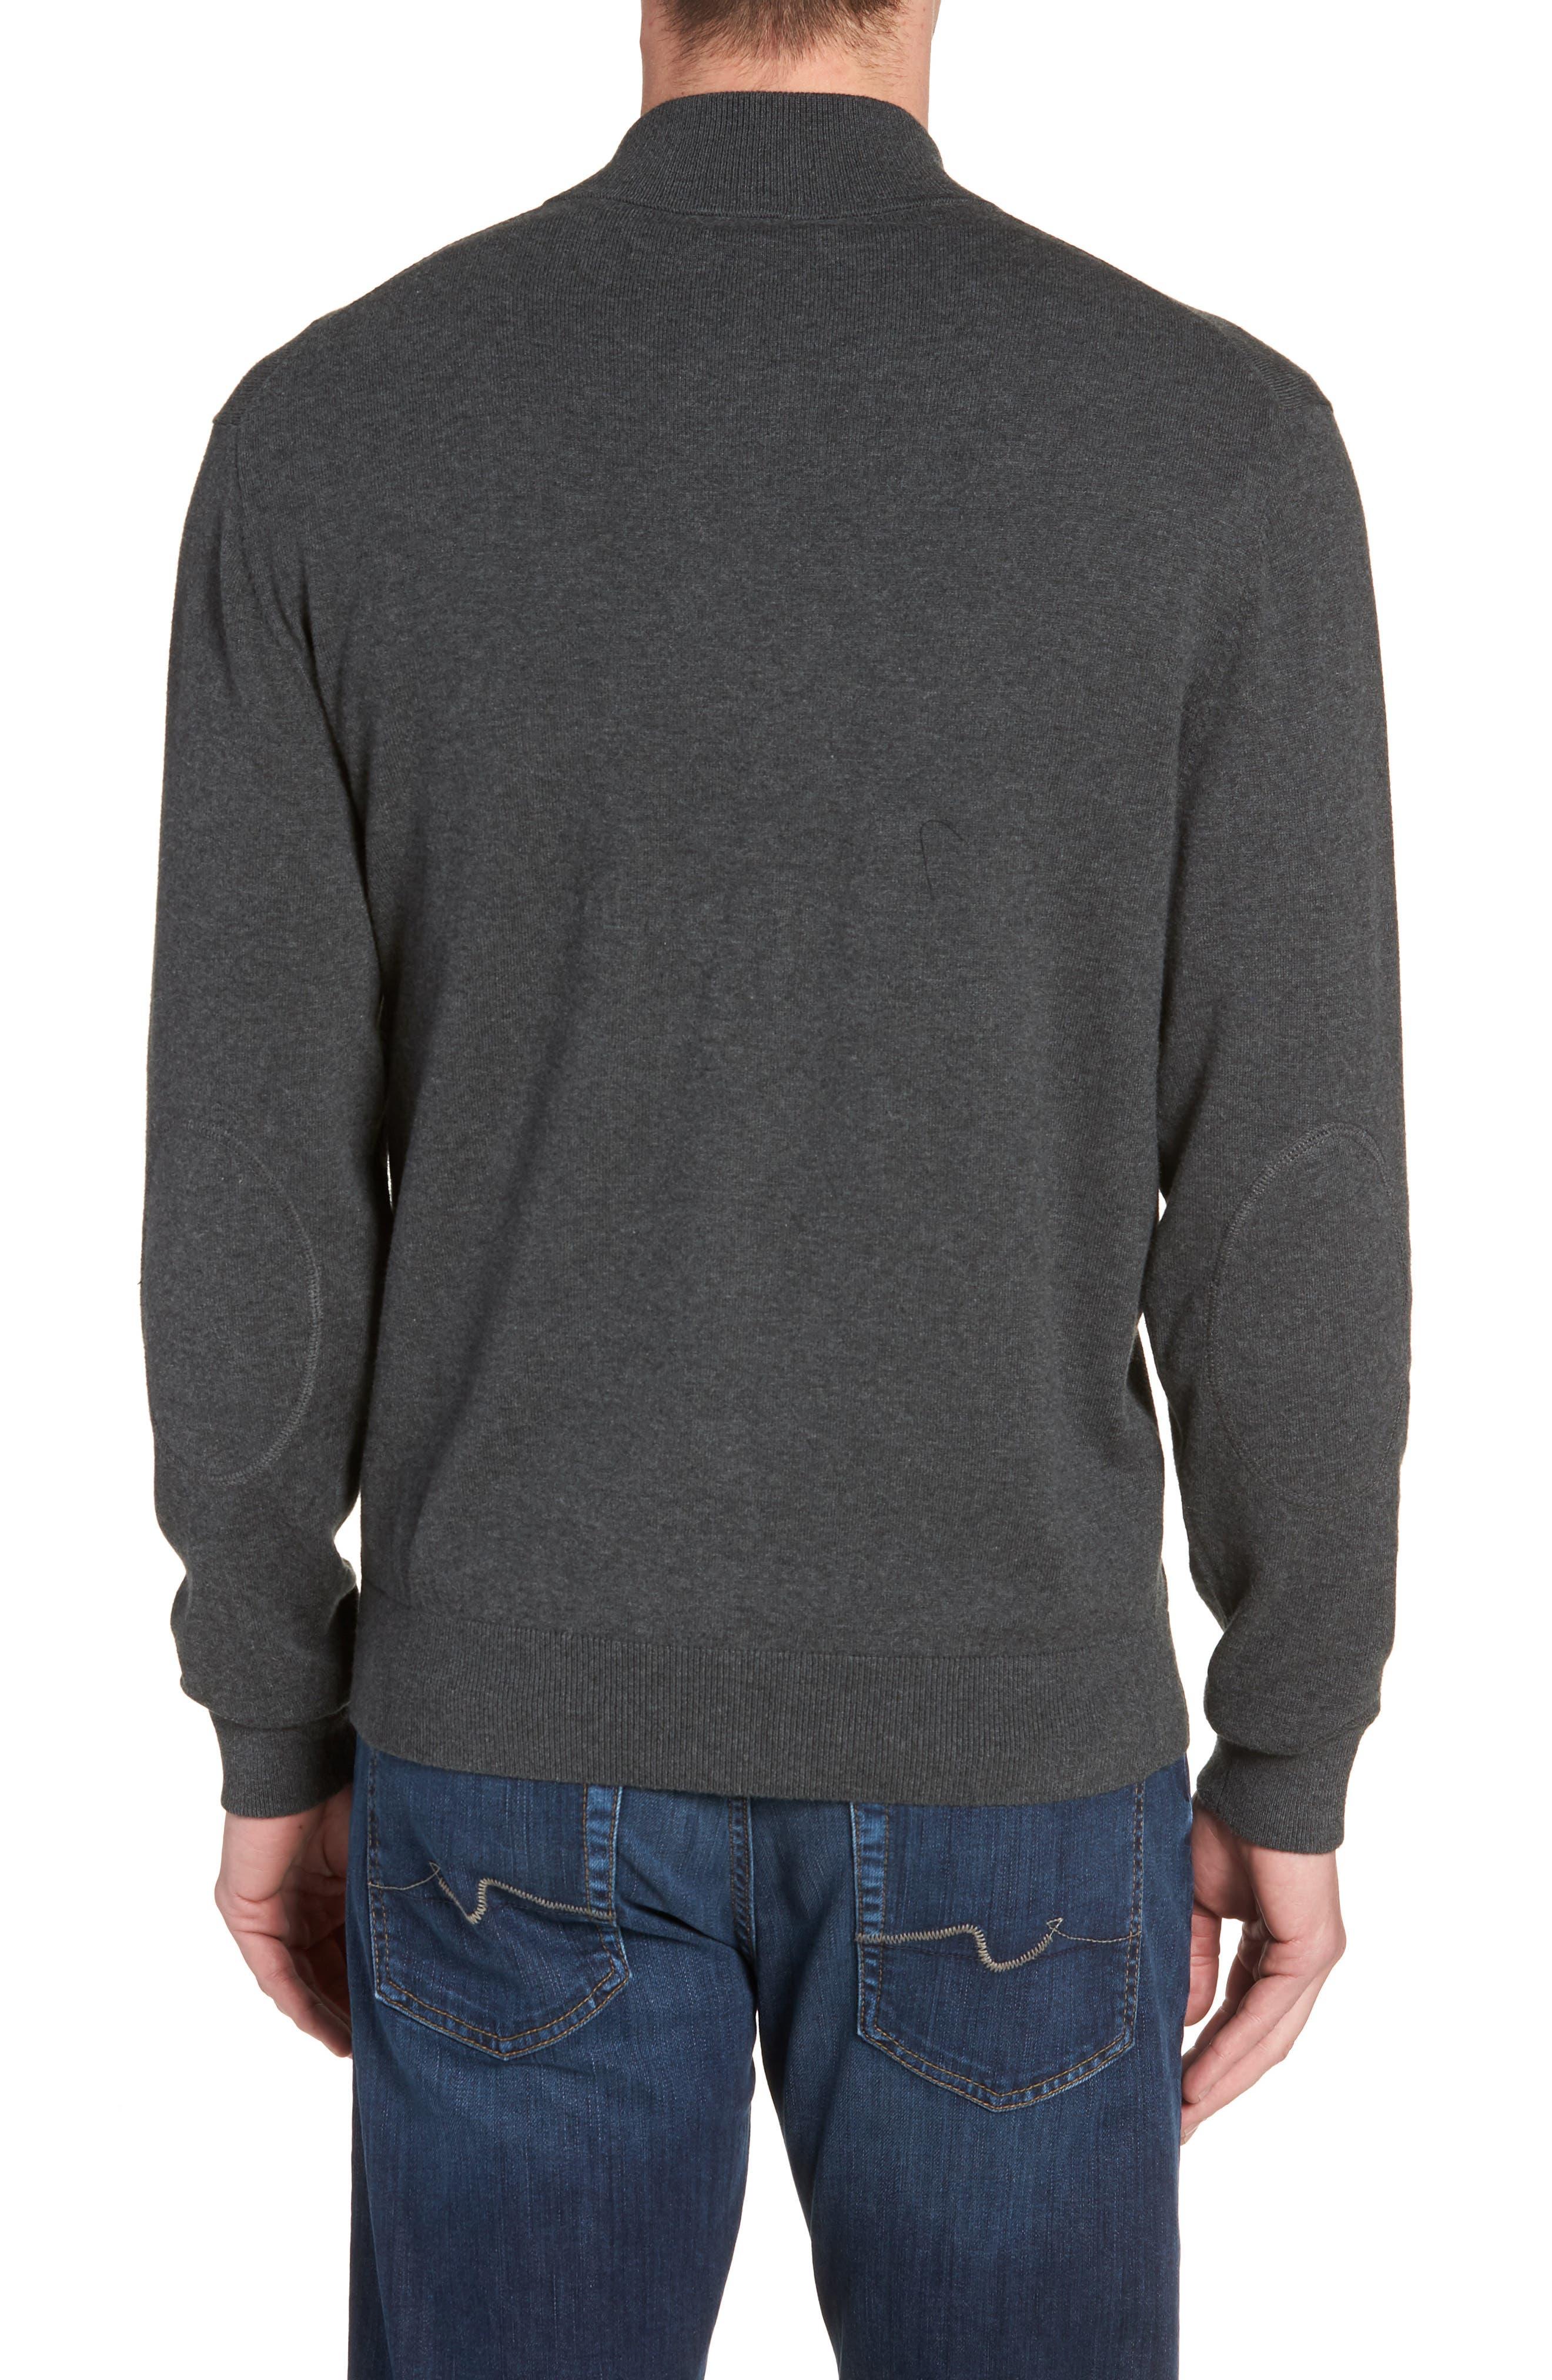 Houston Texans - Lakemont Regular Fit Quarter Zip Sweater,                             Alternate thumbnail 2, color,                             CHARCOAL HEATHER